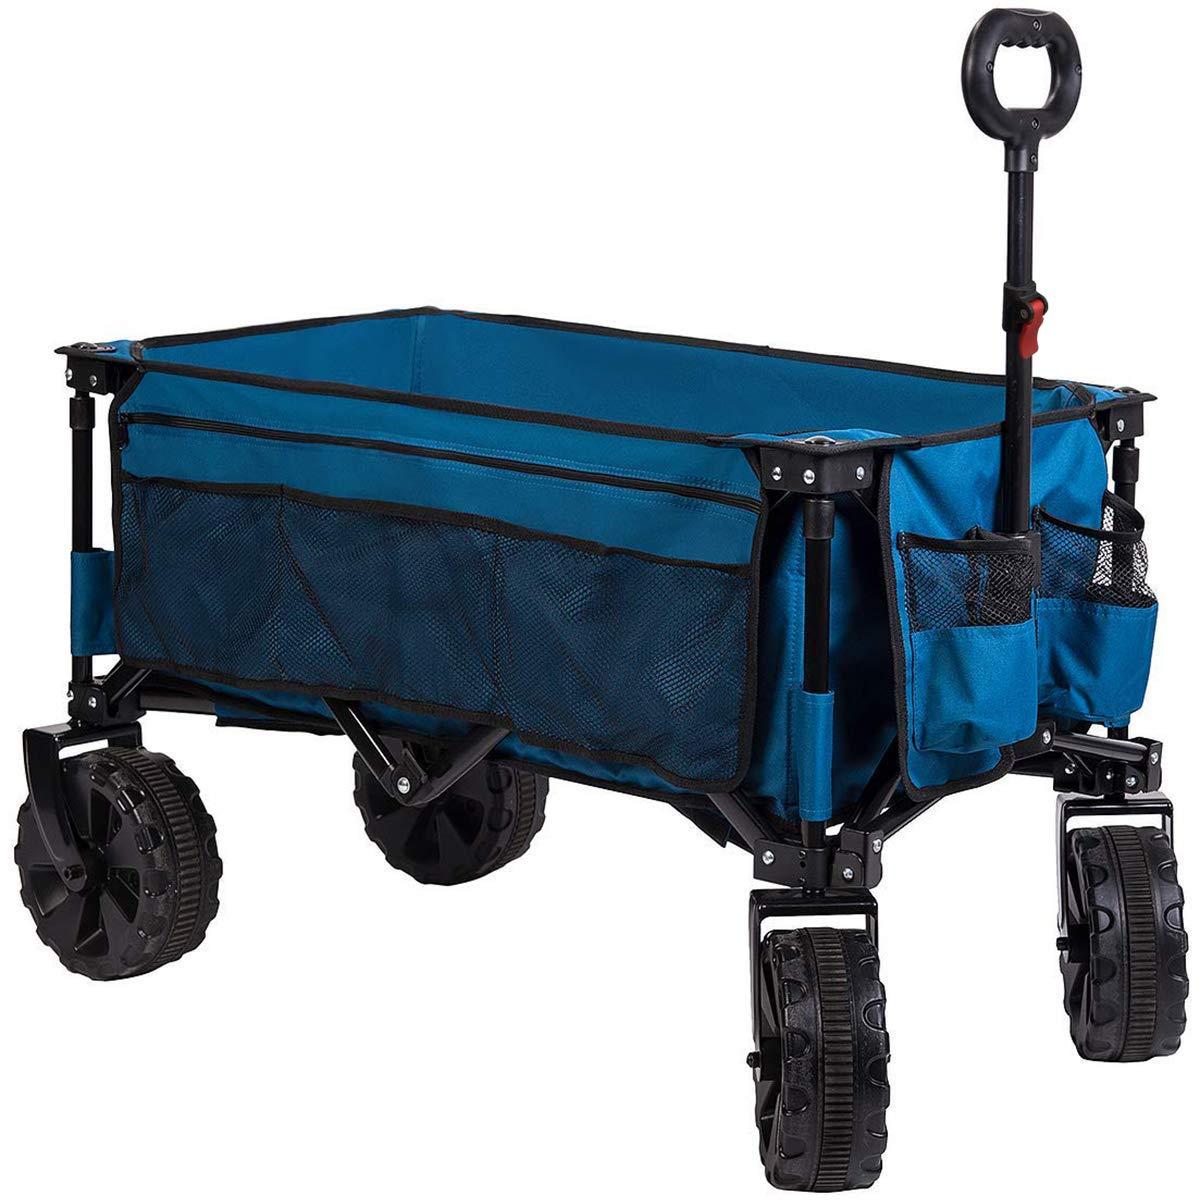 Timber Ridge Folding Camping Collapsible Sturdy Steel Frame Garden Beach Wagon Cart Heavy Duty, Blue-Side Bag